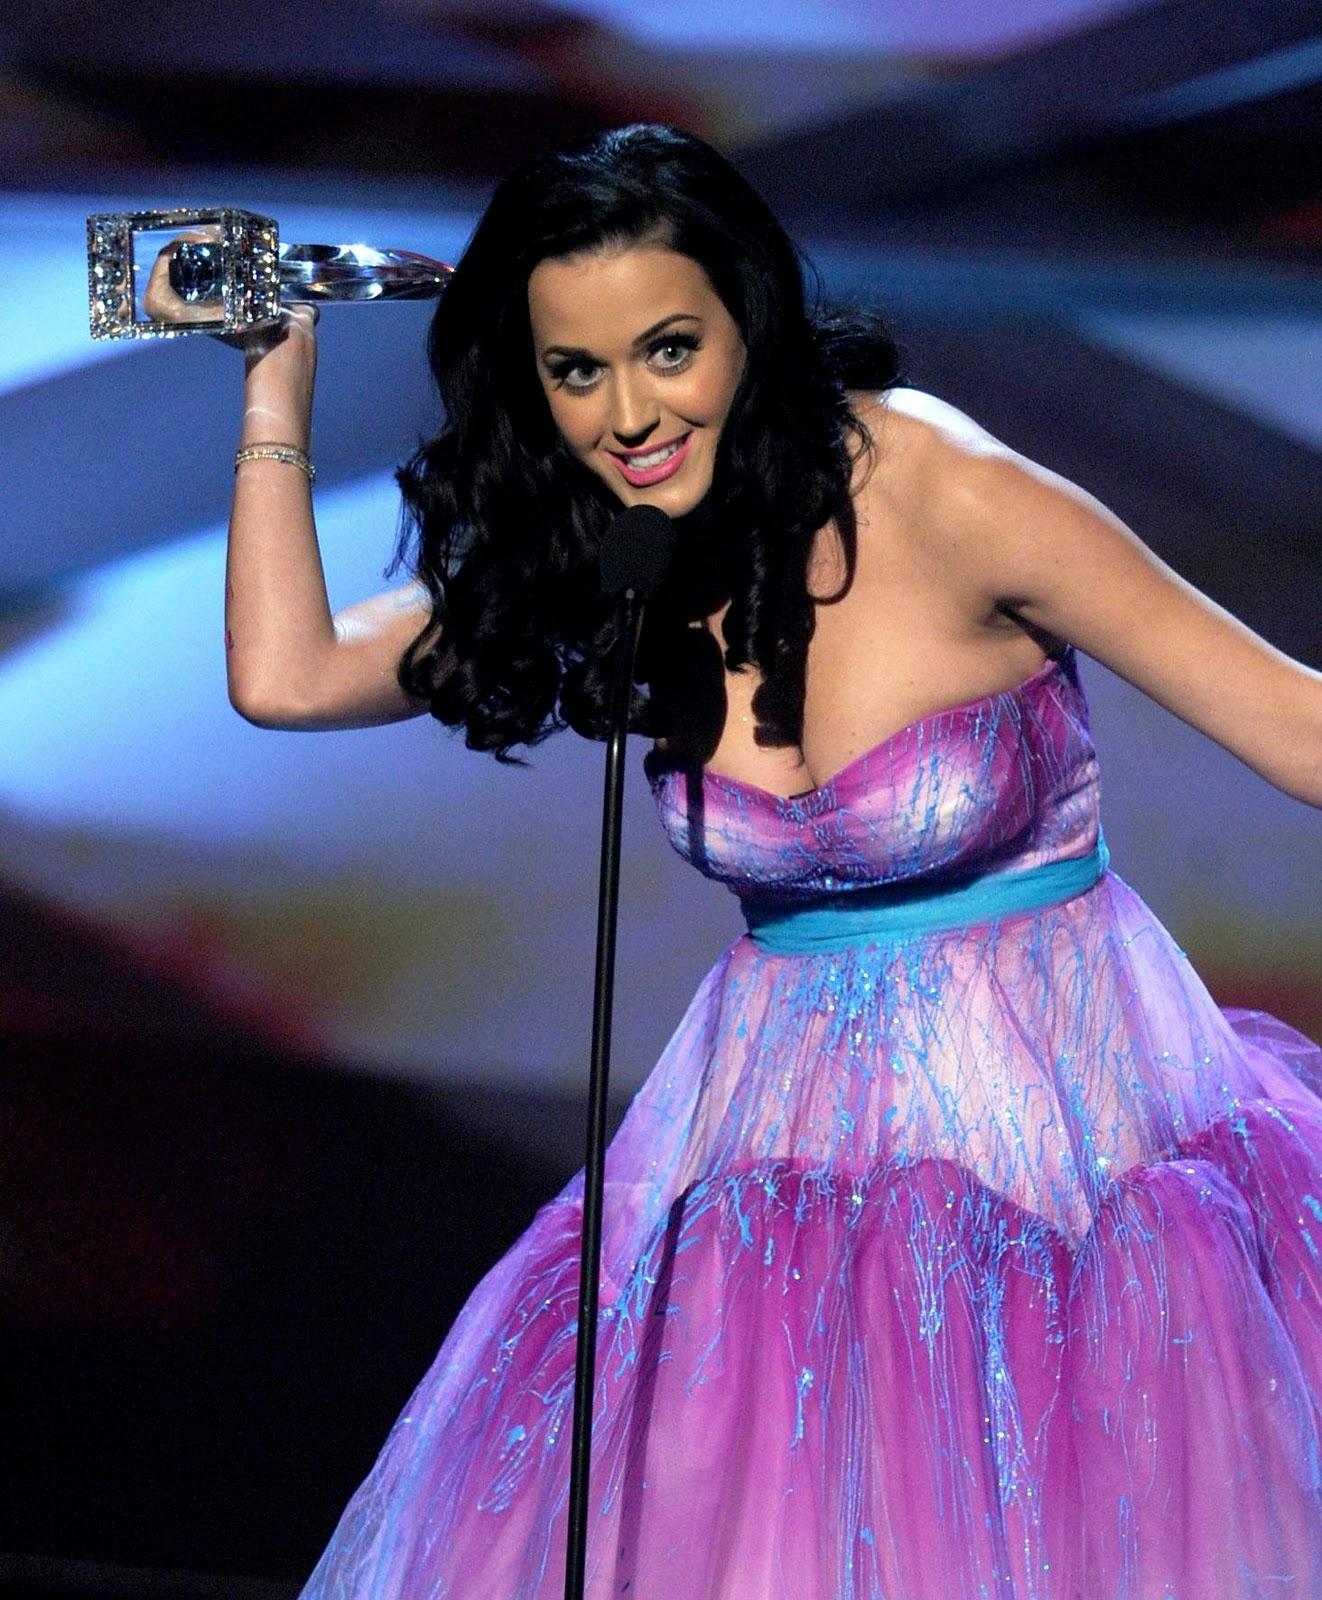 http://3.bp.blogspot.com/_u90AC4da1zY/TSg_ECM24VI/AAAAAAAAPWM/olZBvFkCnPo/s1600/Katy-Perry-12.jpg